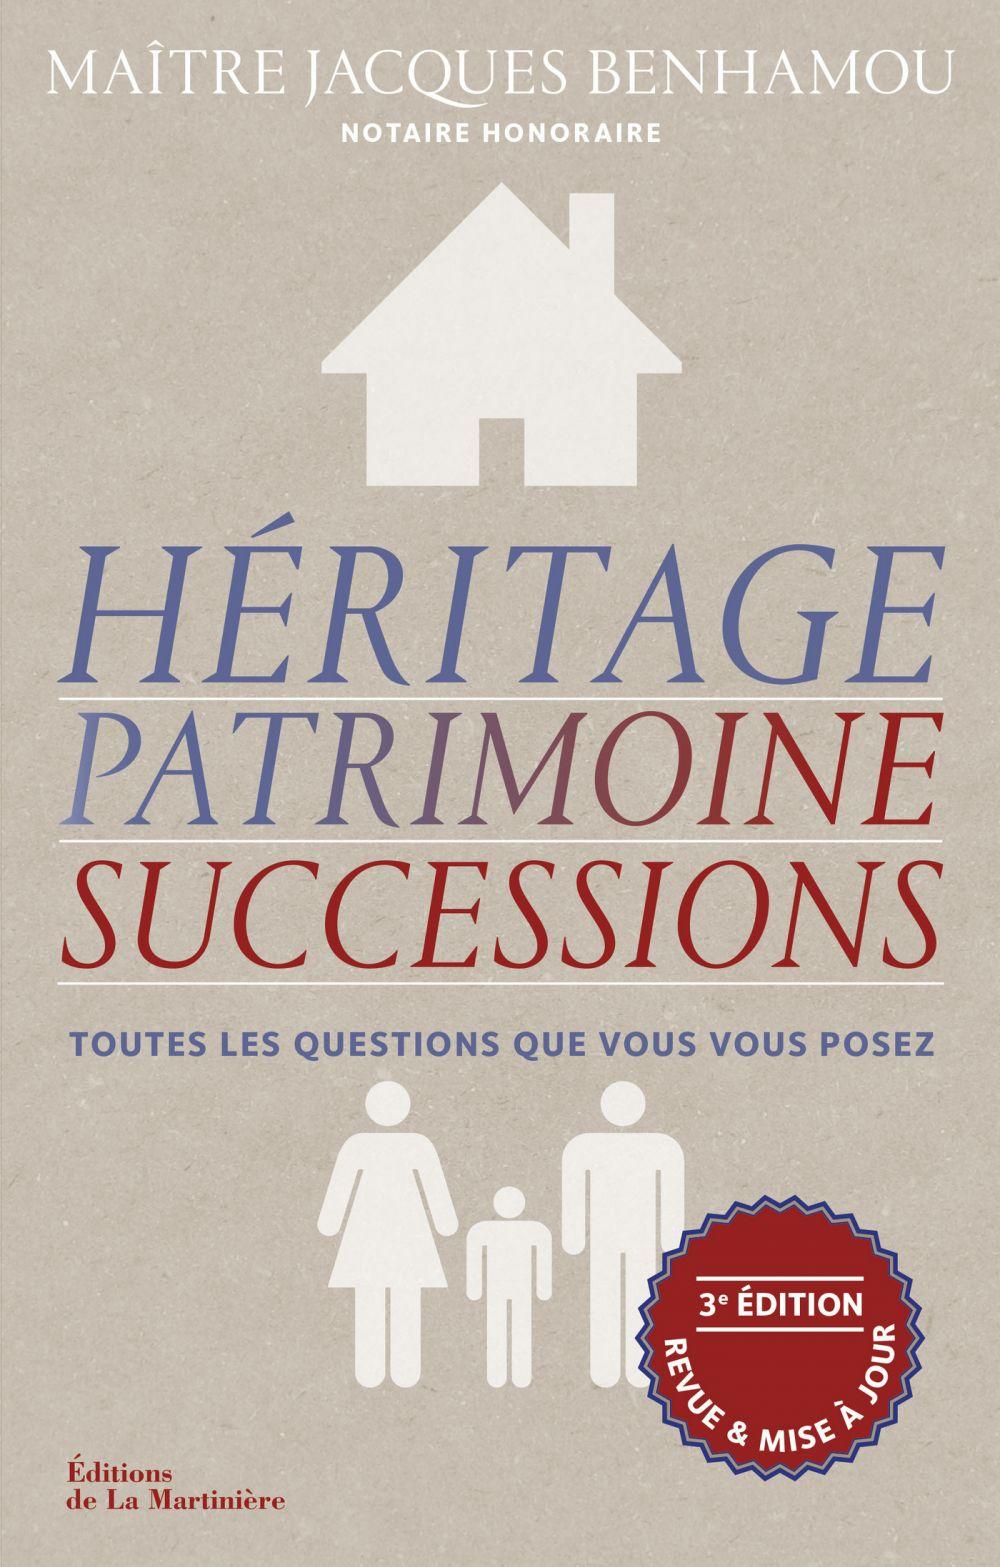 Héritage, patrimoine, successions |